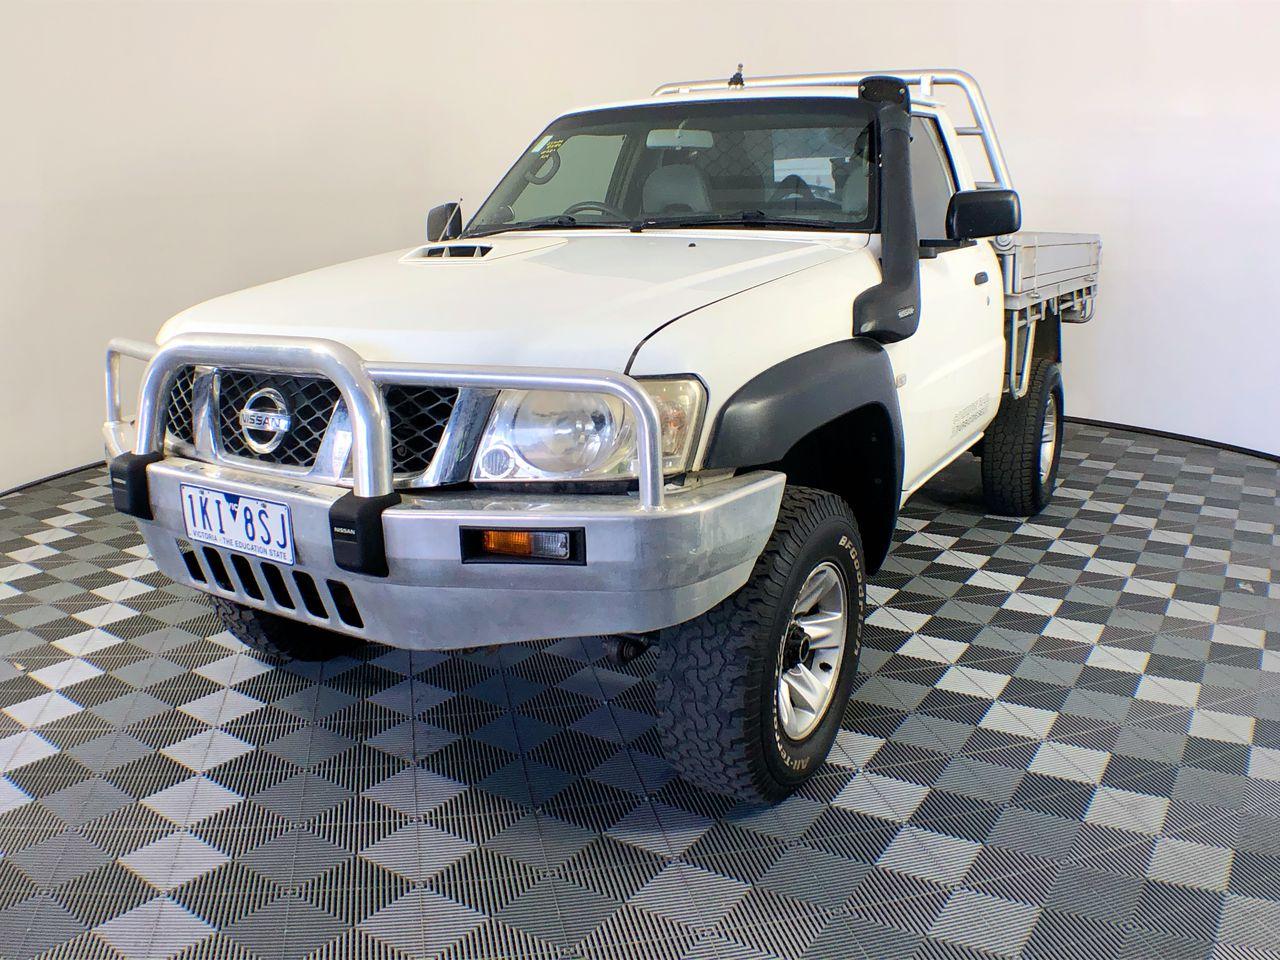 2010 Nissan Patrol DX (4x4) GU 5.7 Litre V8 Manual Cab Chassis 76,600km